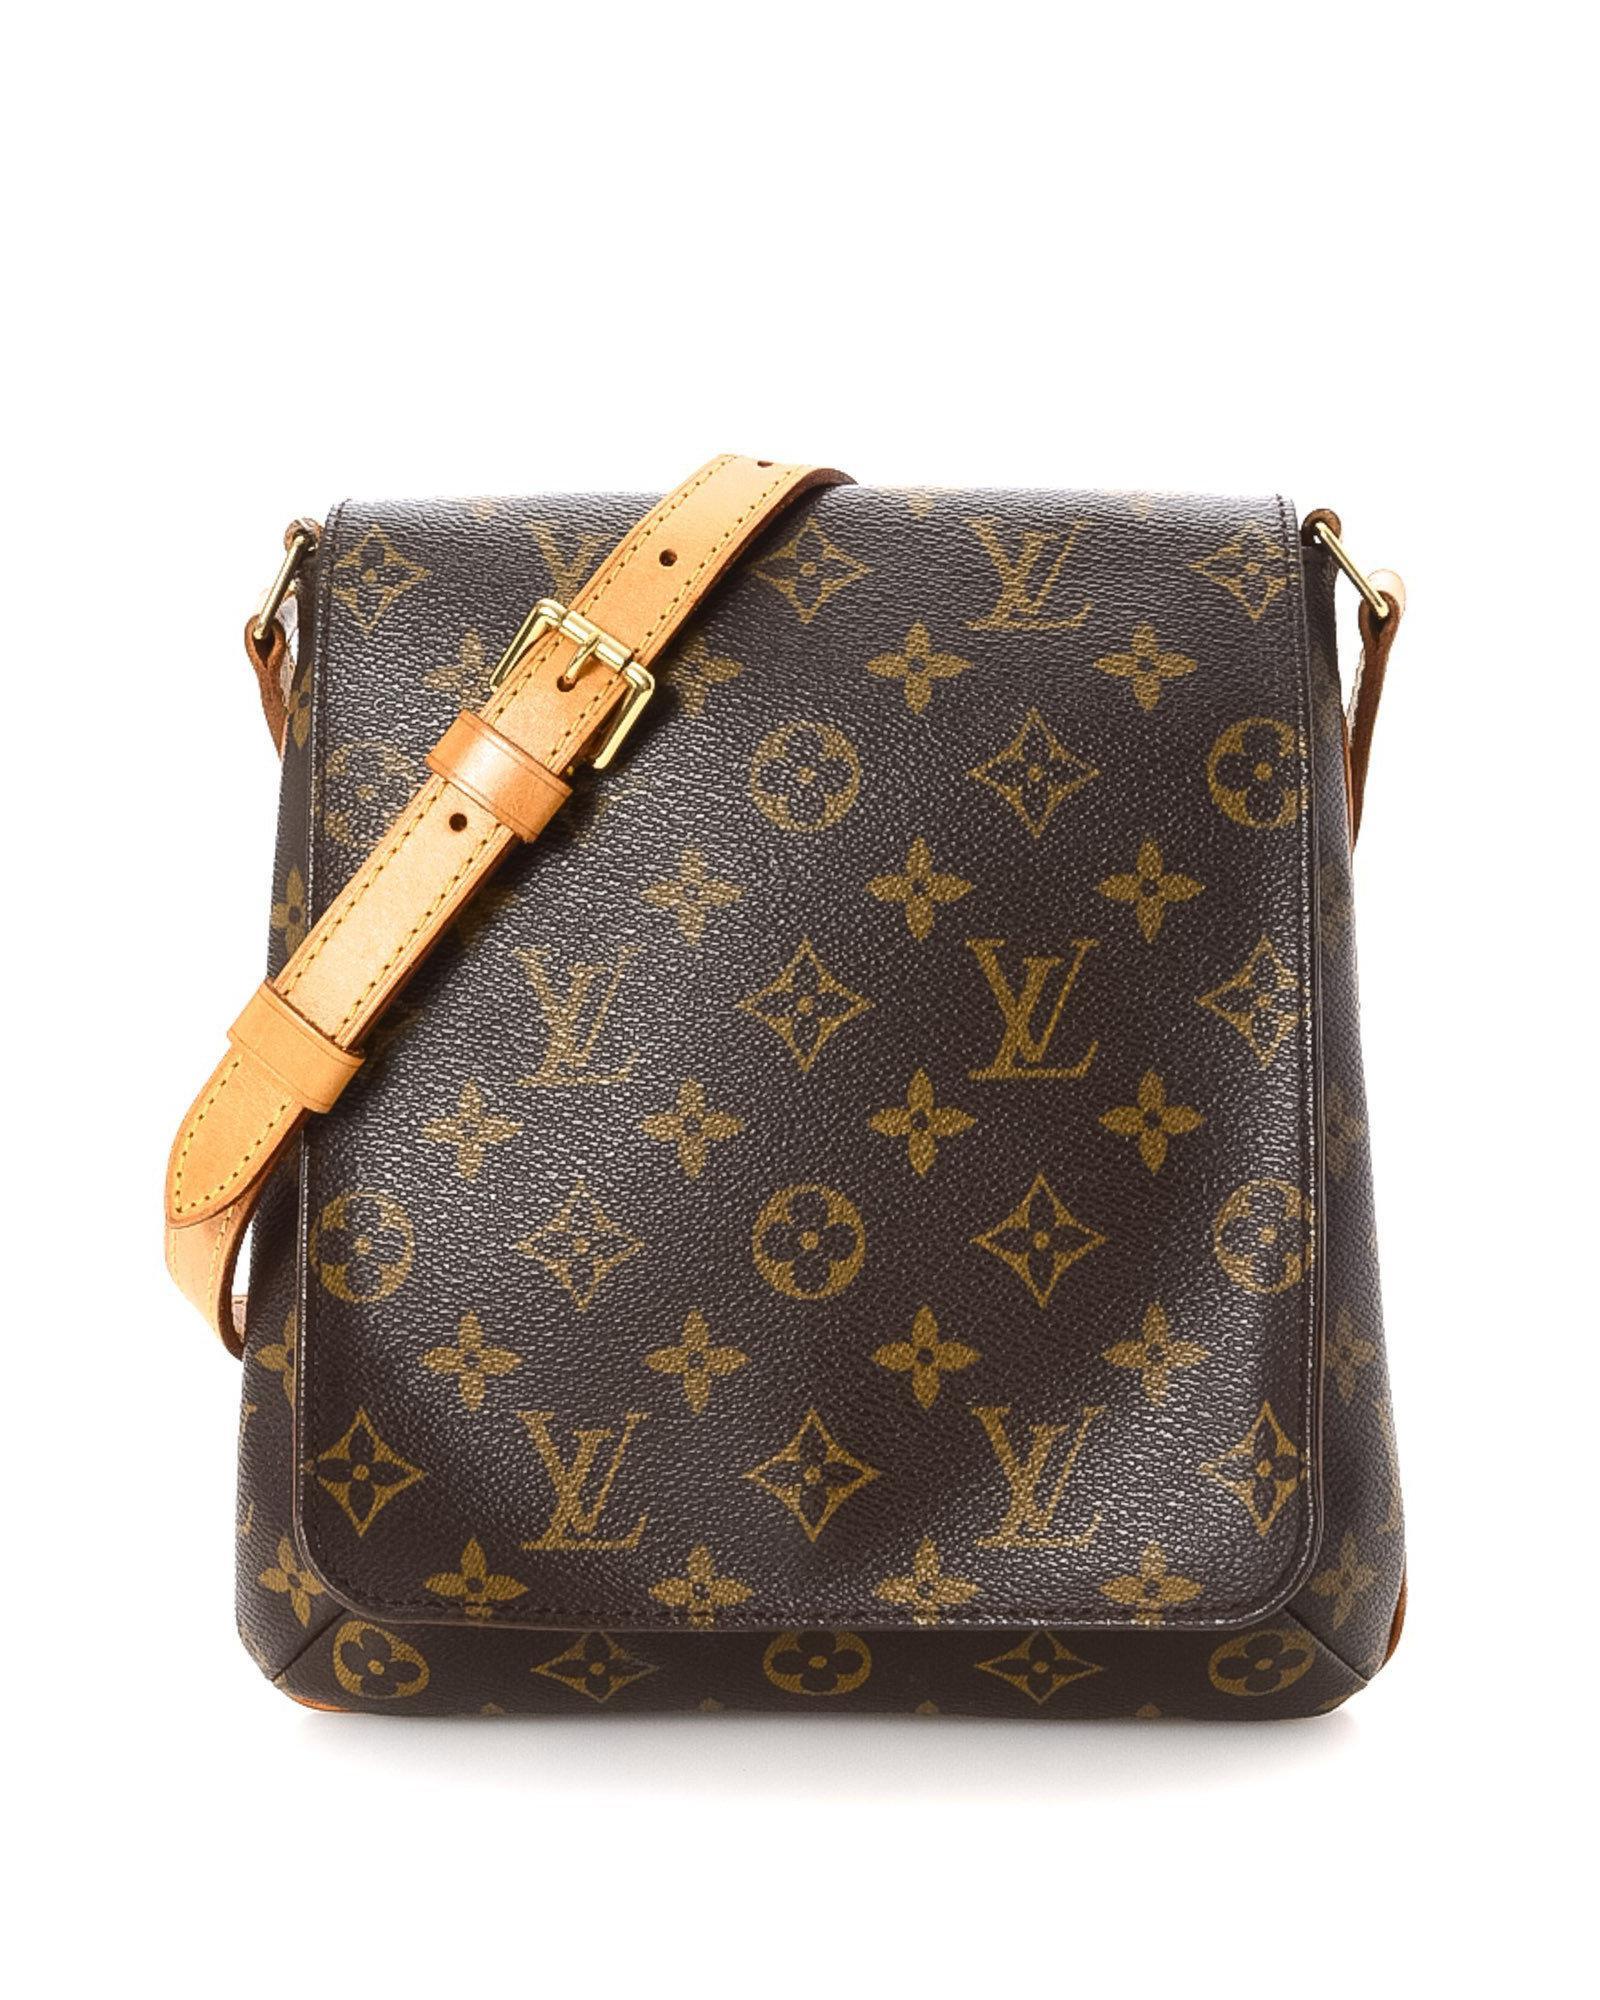 73a05bb7df5d1 Louis Vuitton Monogram Musette Salsa Long Strap Crossbody Bag ...